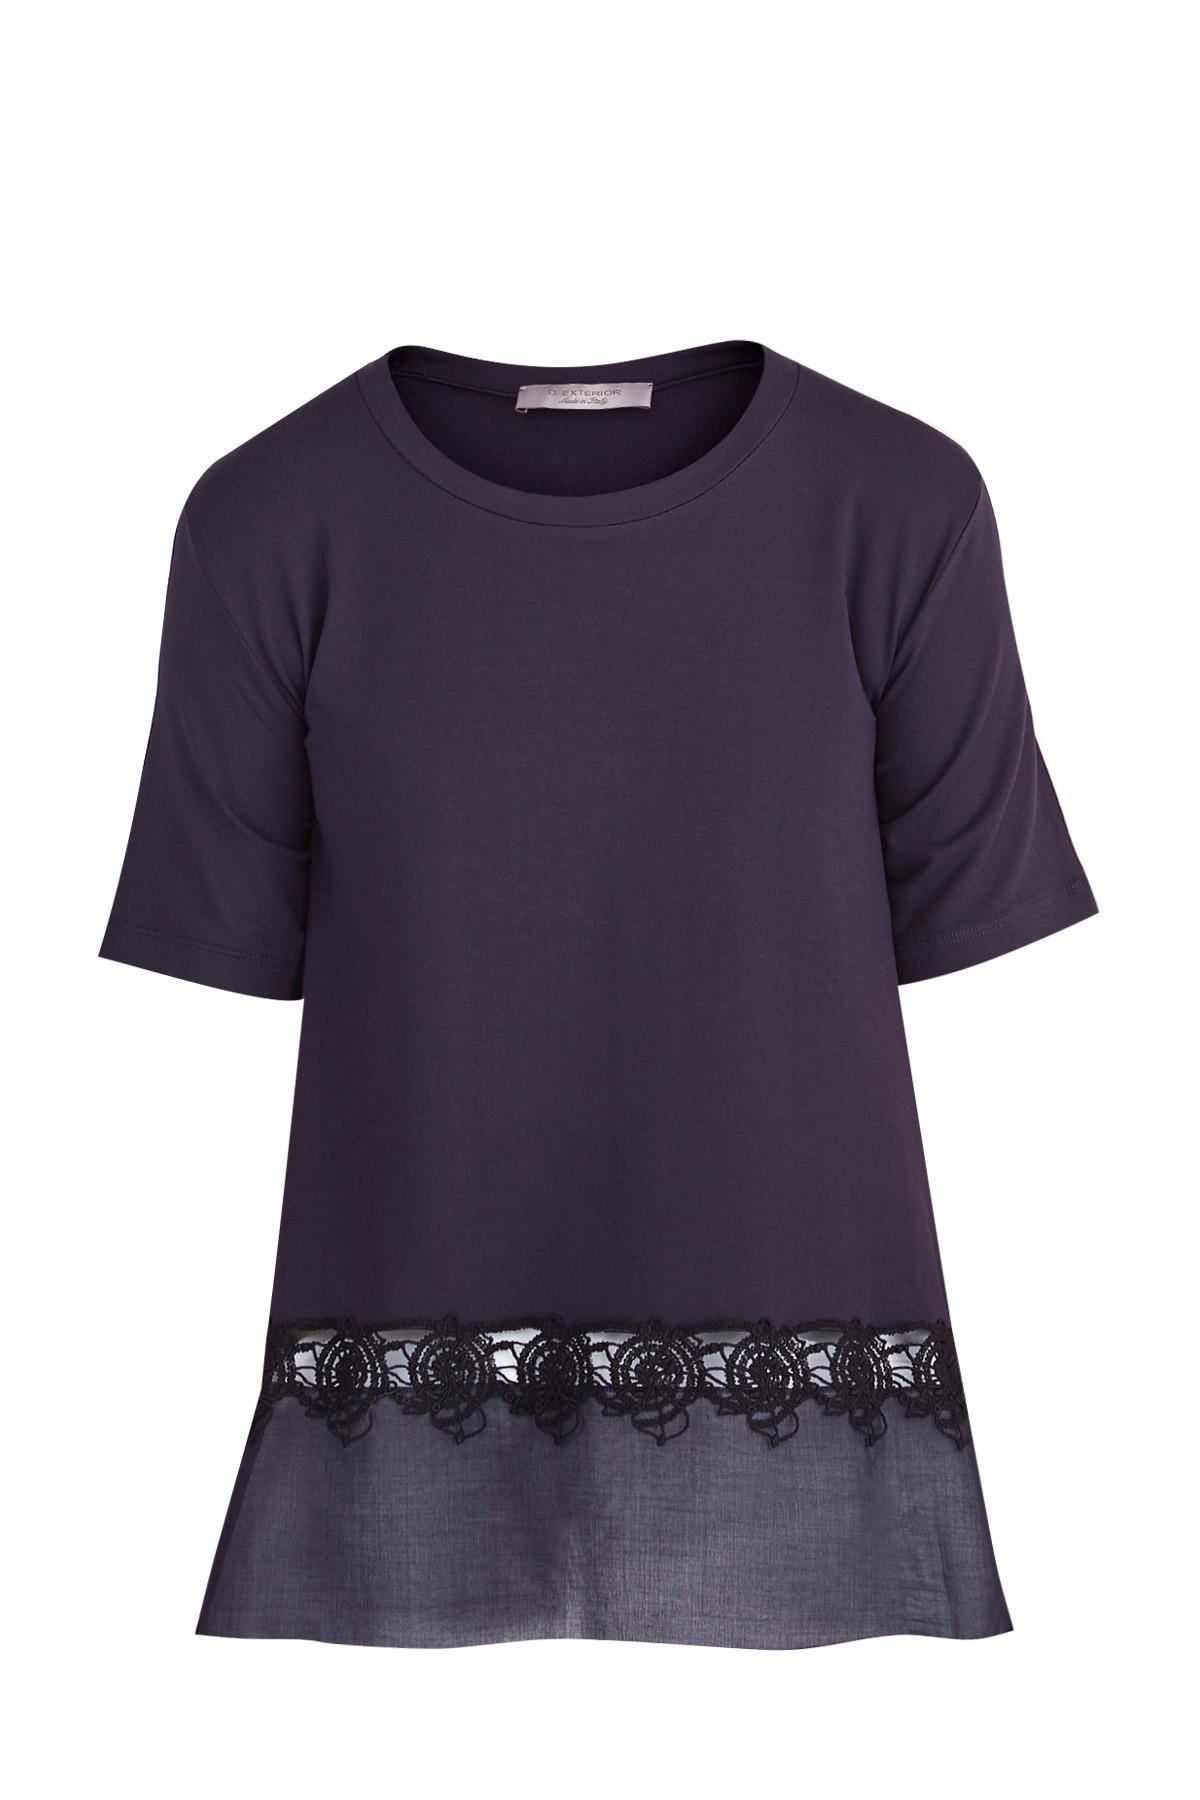 блузкаБлузки, рубашки<br><br>Материал: вискоза 95% ,  эластан 5% ,  хлопок 100%;